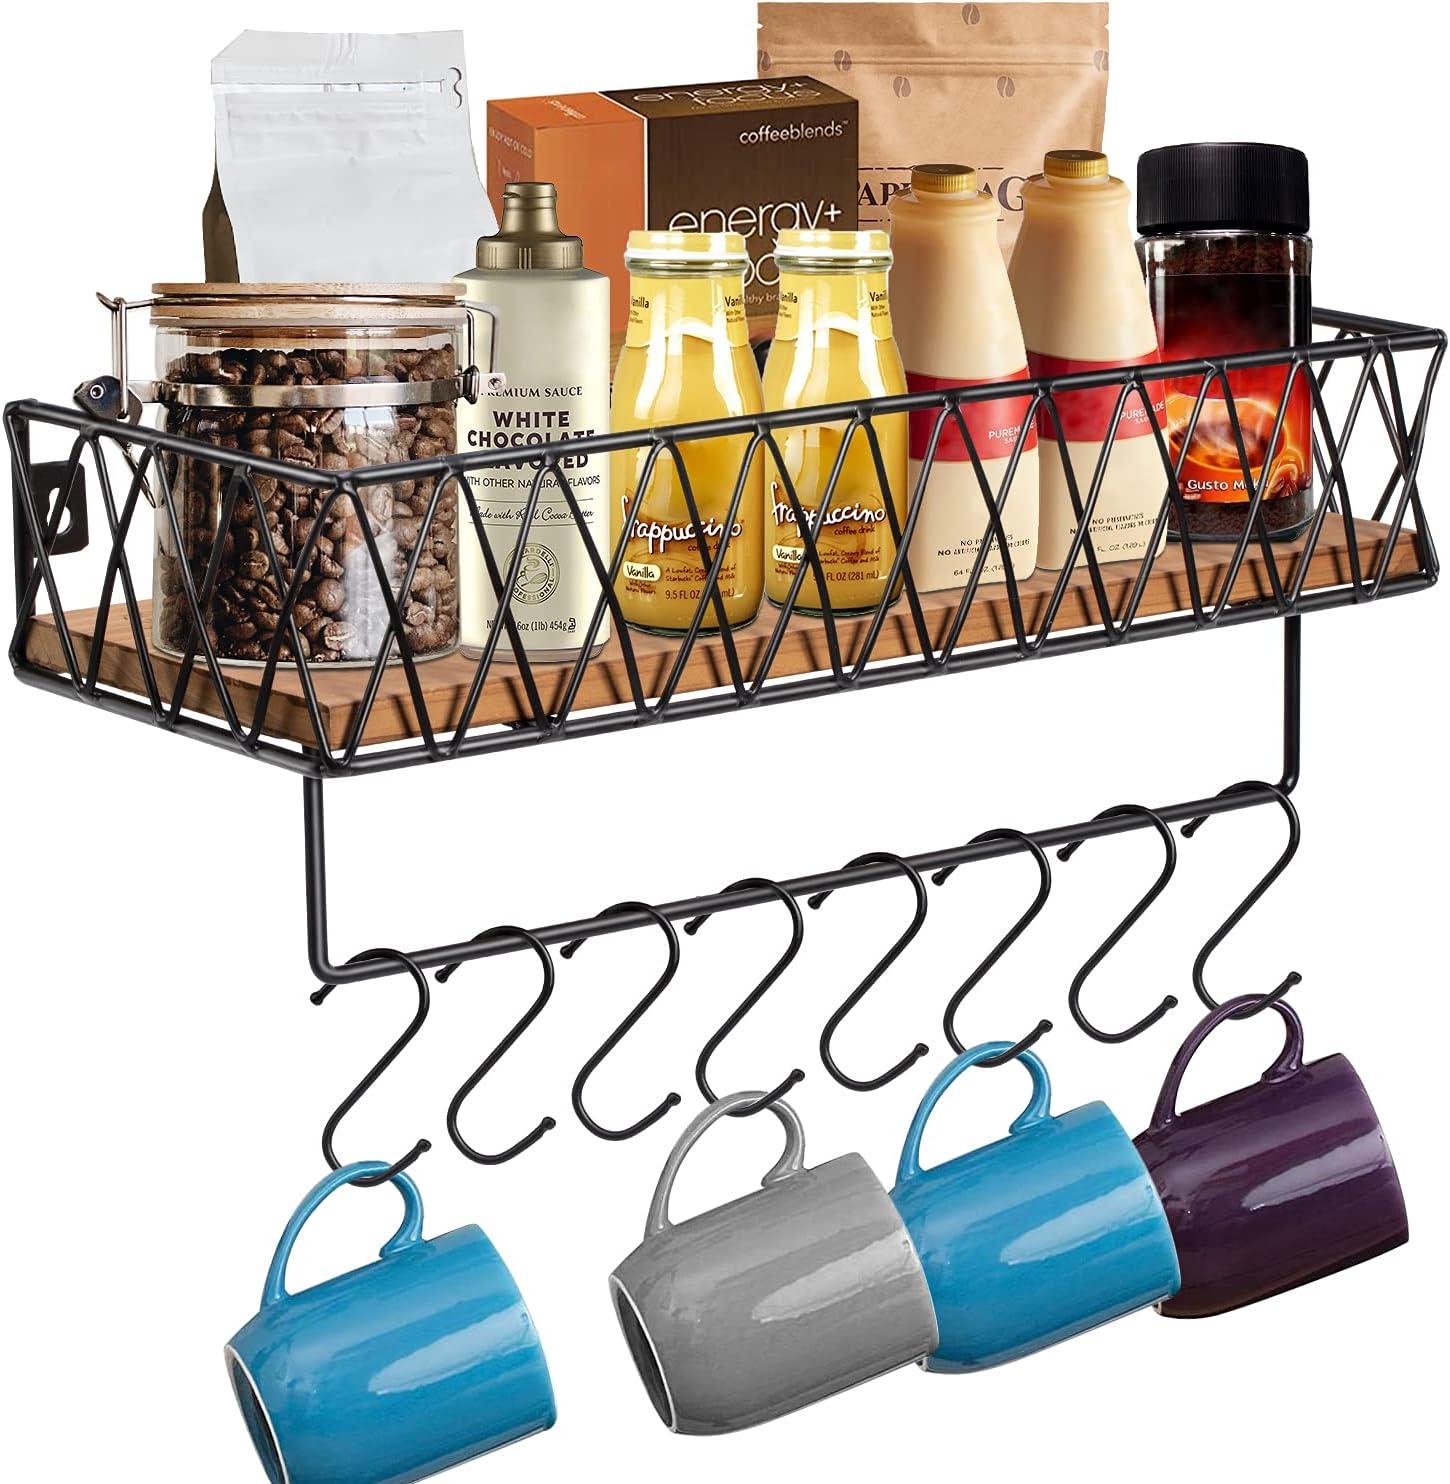 Coffee Mug Holder, Wall Mounted Coffee Mug Rack with Rails and Towel Bar, Rustic Wood Coffee Cup Holder with 8 Adjustable Hooks, Coffee Cup Rack, Coffee Station, Utensils Hooks Hanger